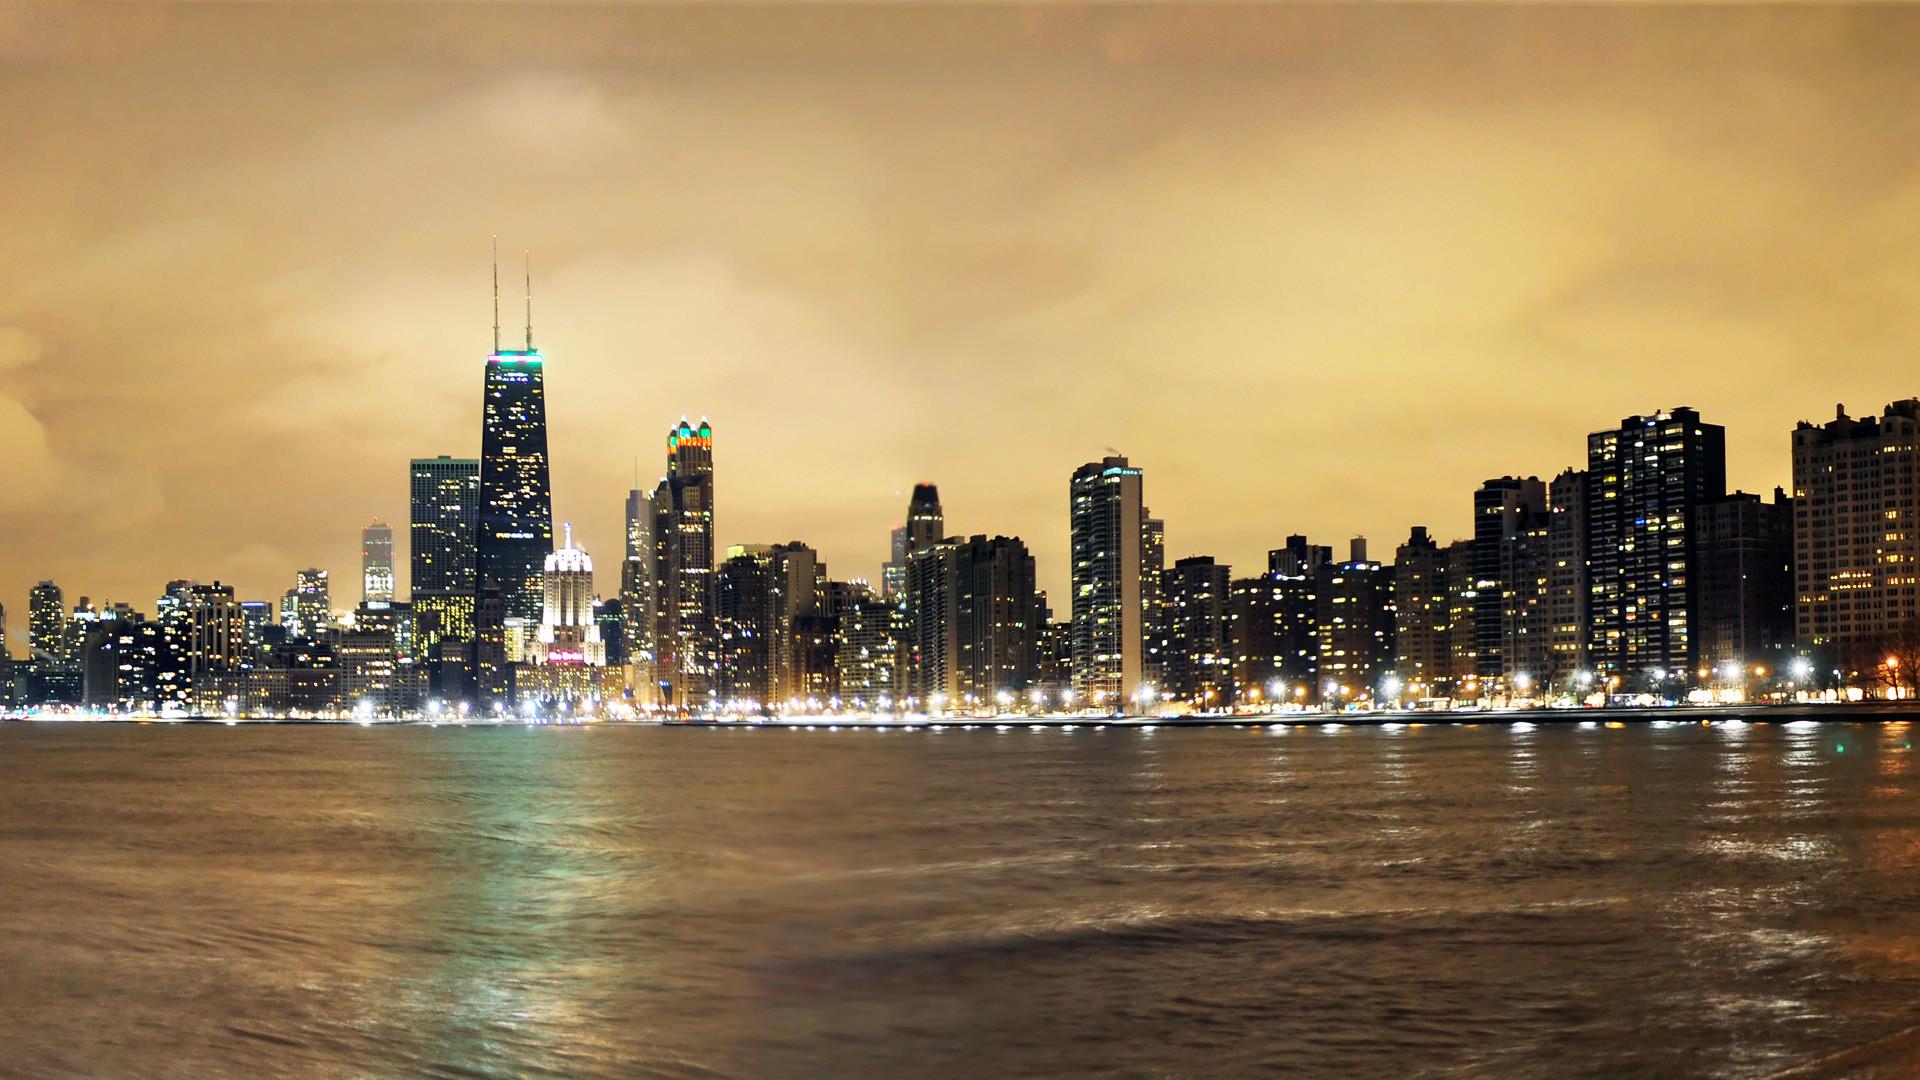 Chicago skyline wallpaper 72 images - Skyline night wallpaper ...